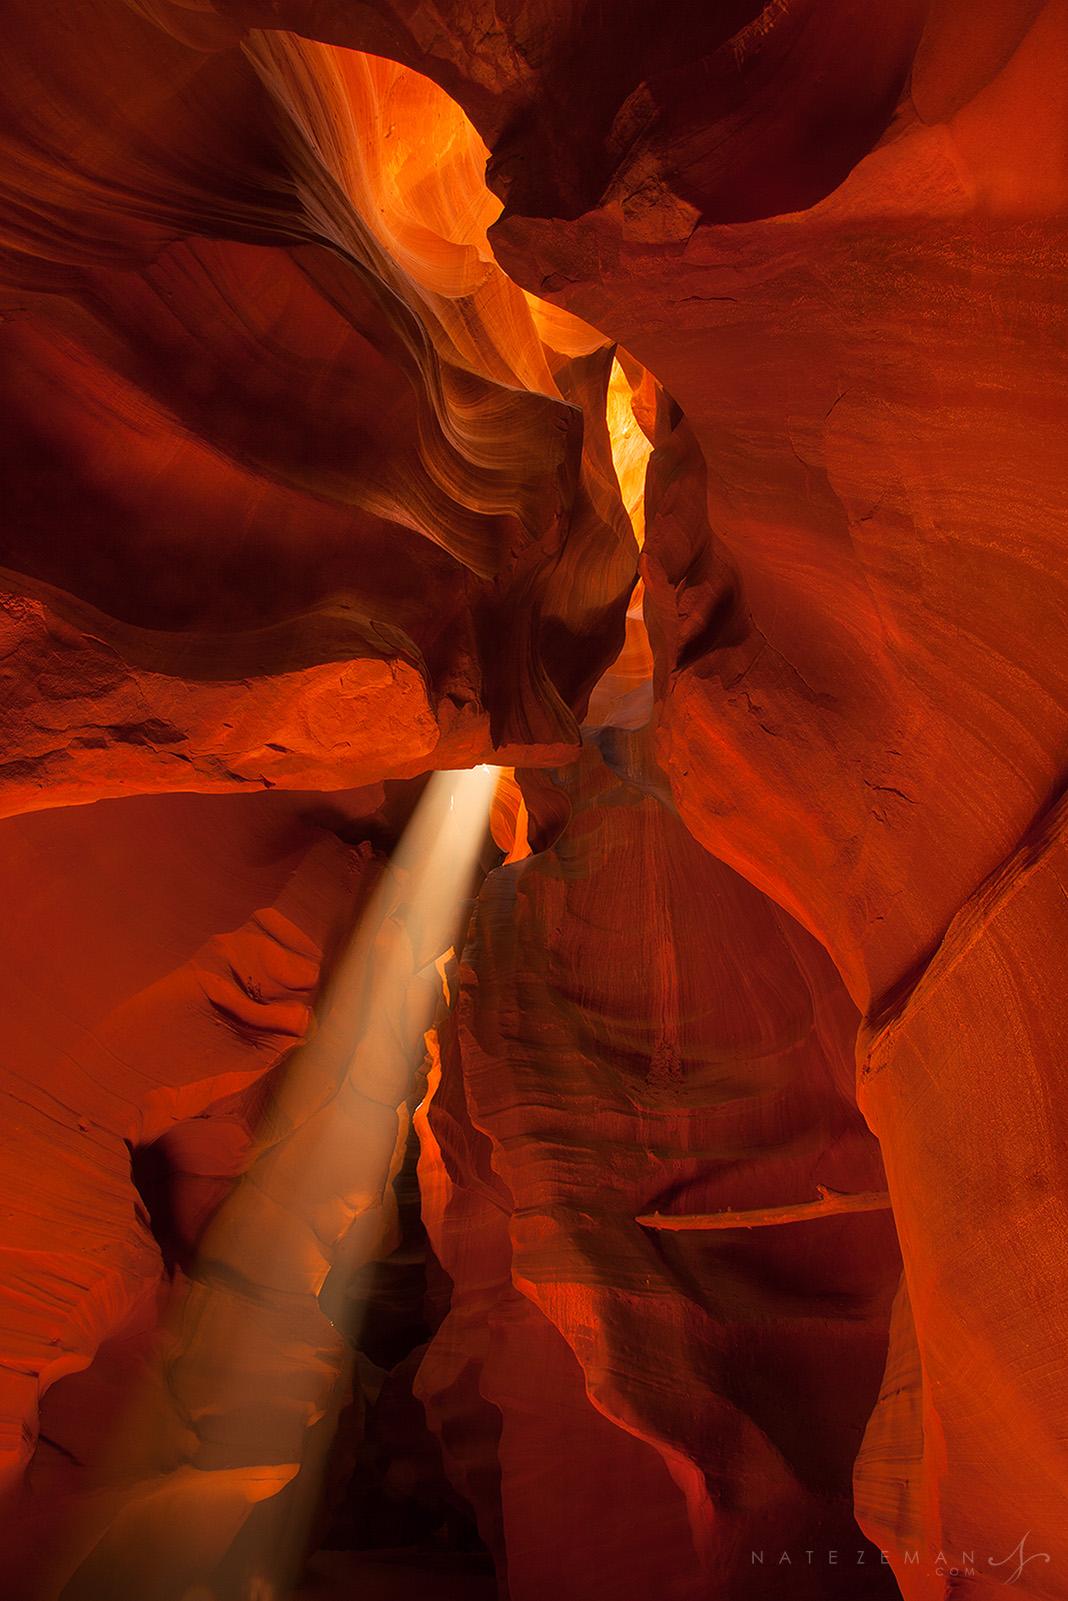 antelope canyon, slot canyon, light beam, red, sculpture, navajo nation, arizona, , photo